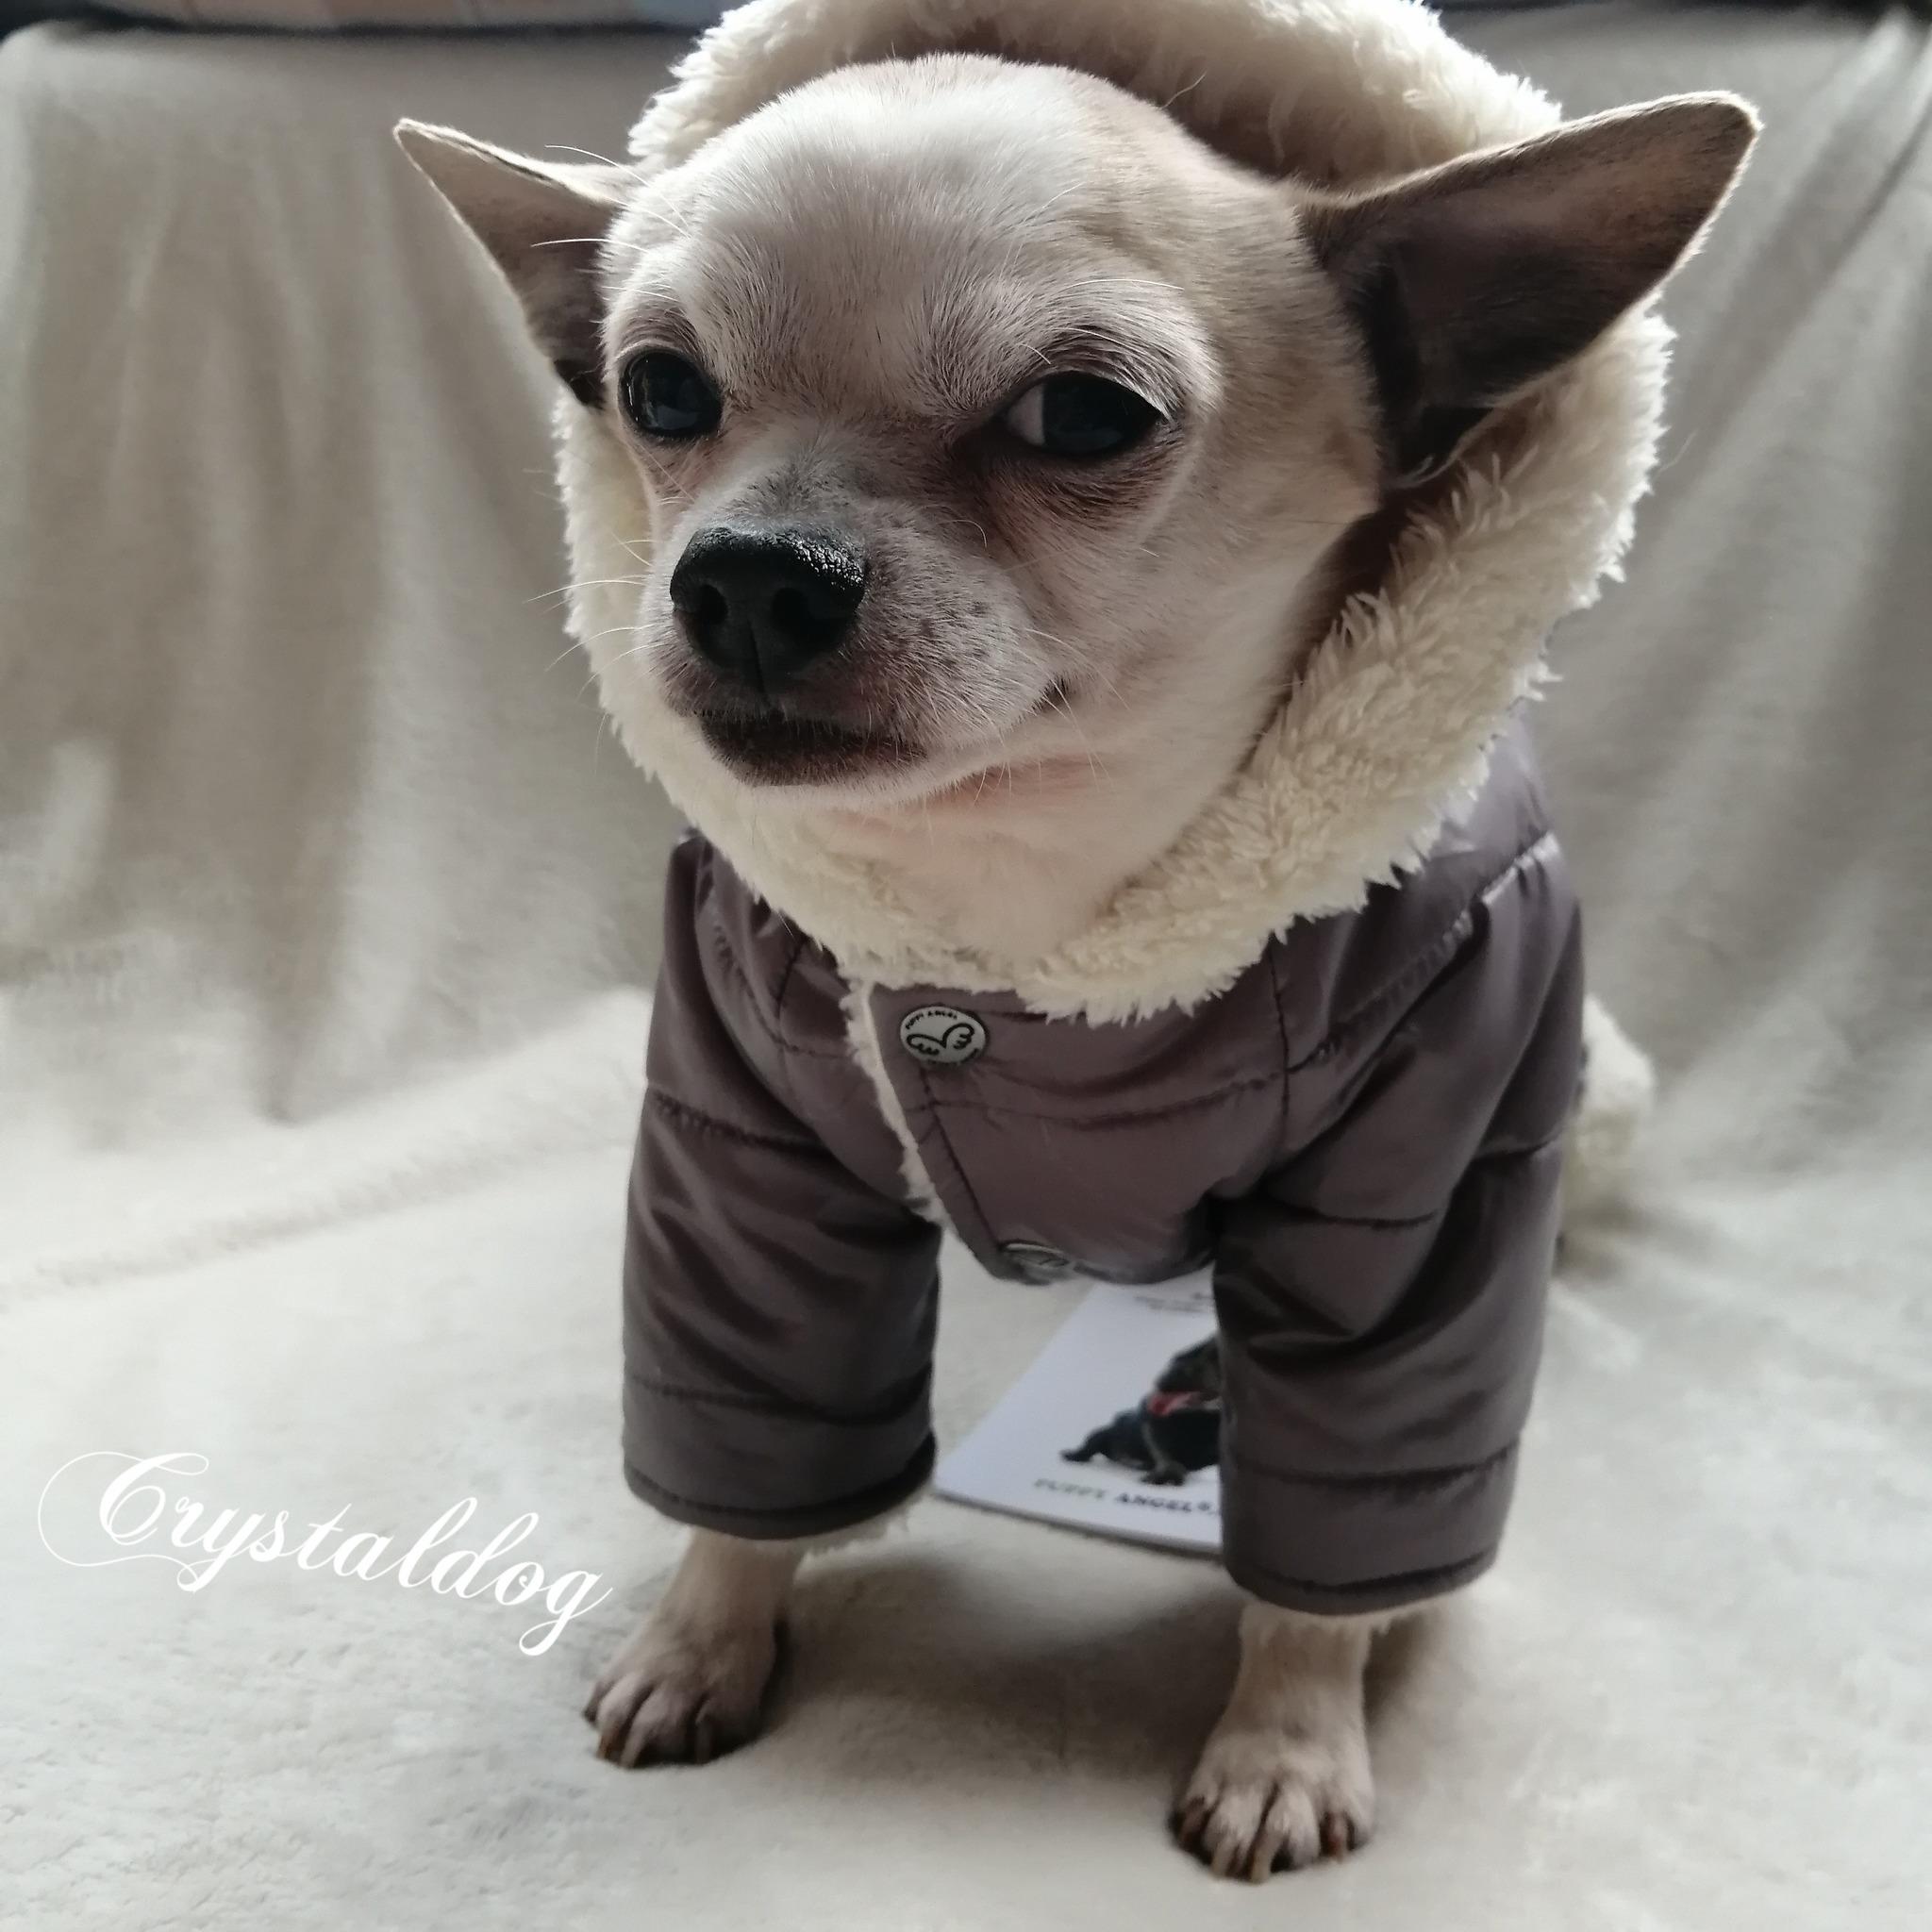 544 PA - Комбинезоны для собак